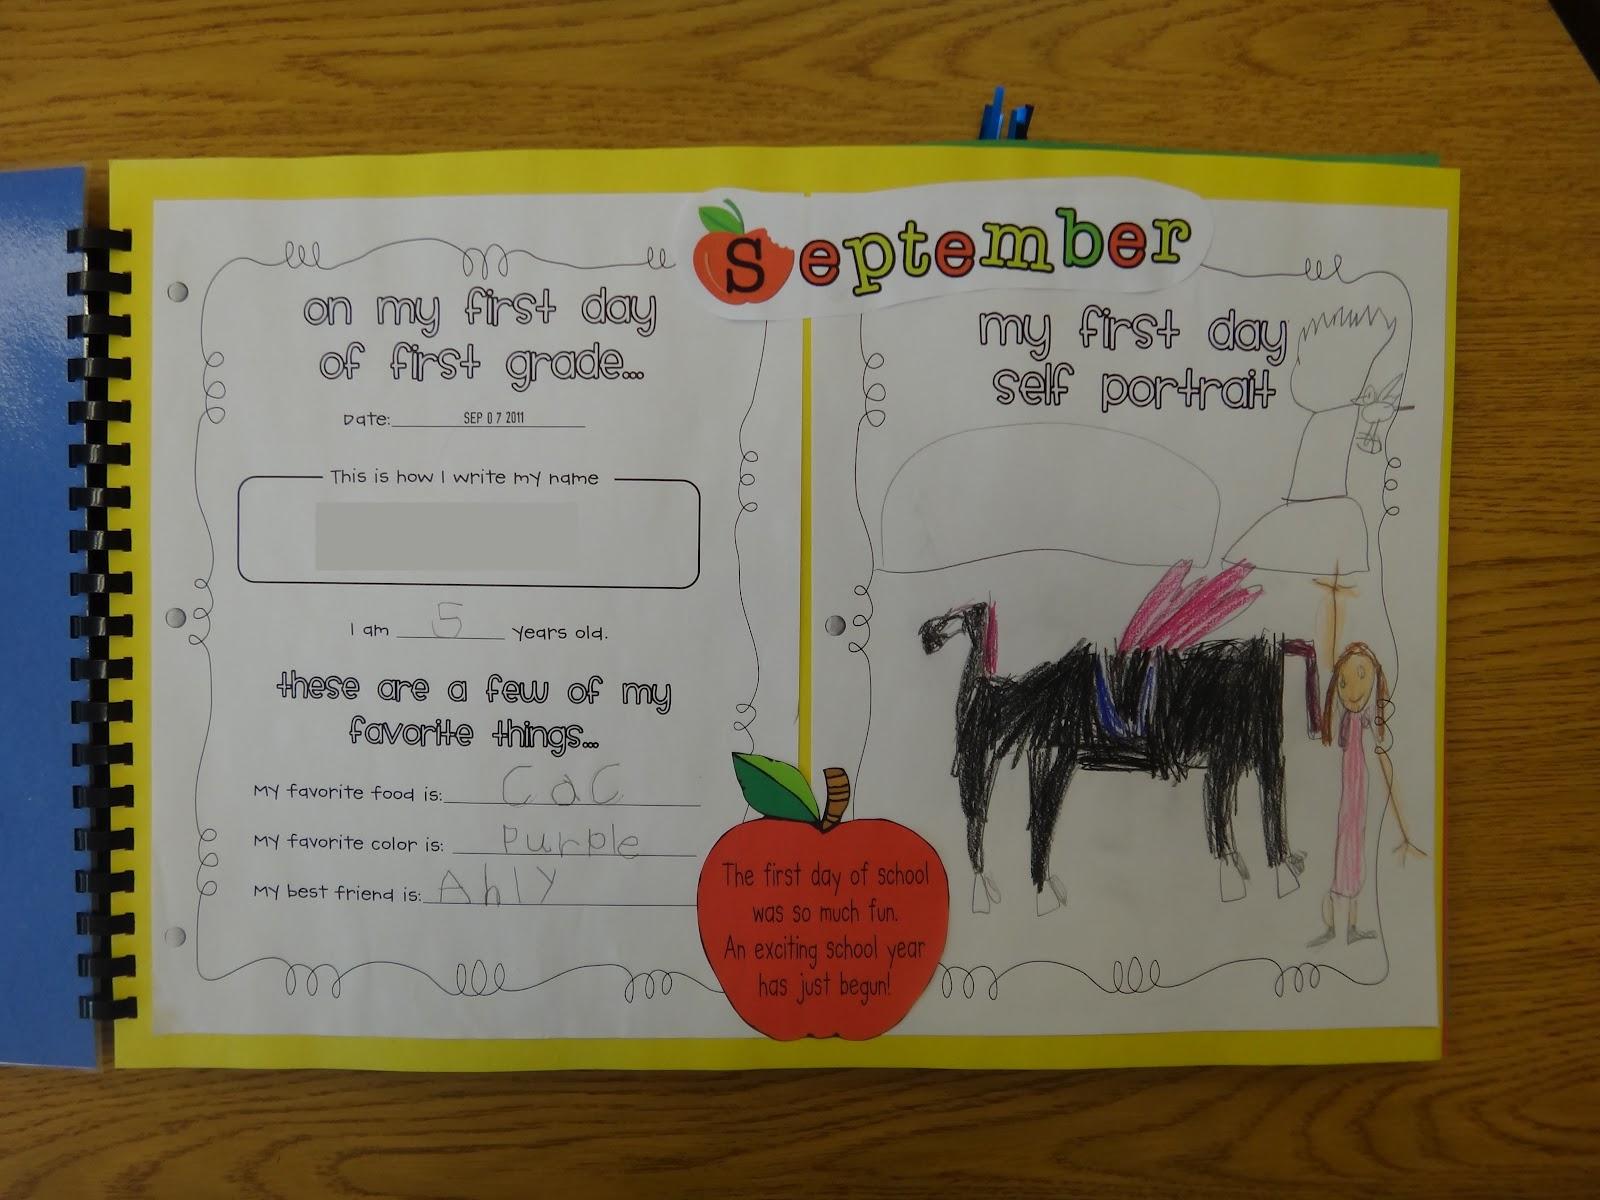 Scrapbook ideas writing - Wednesday 2 May 2012